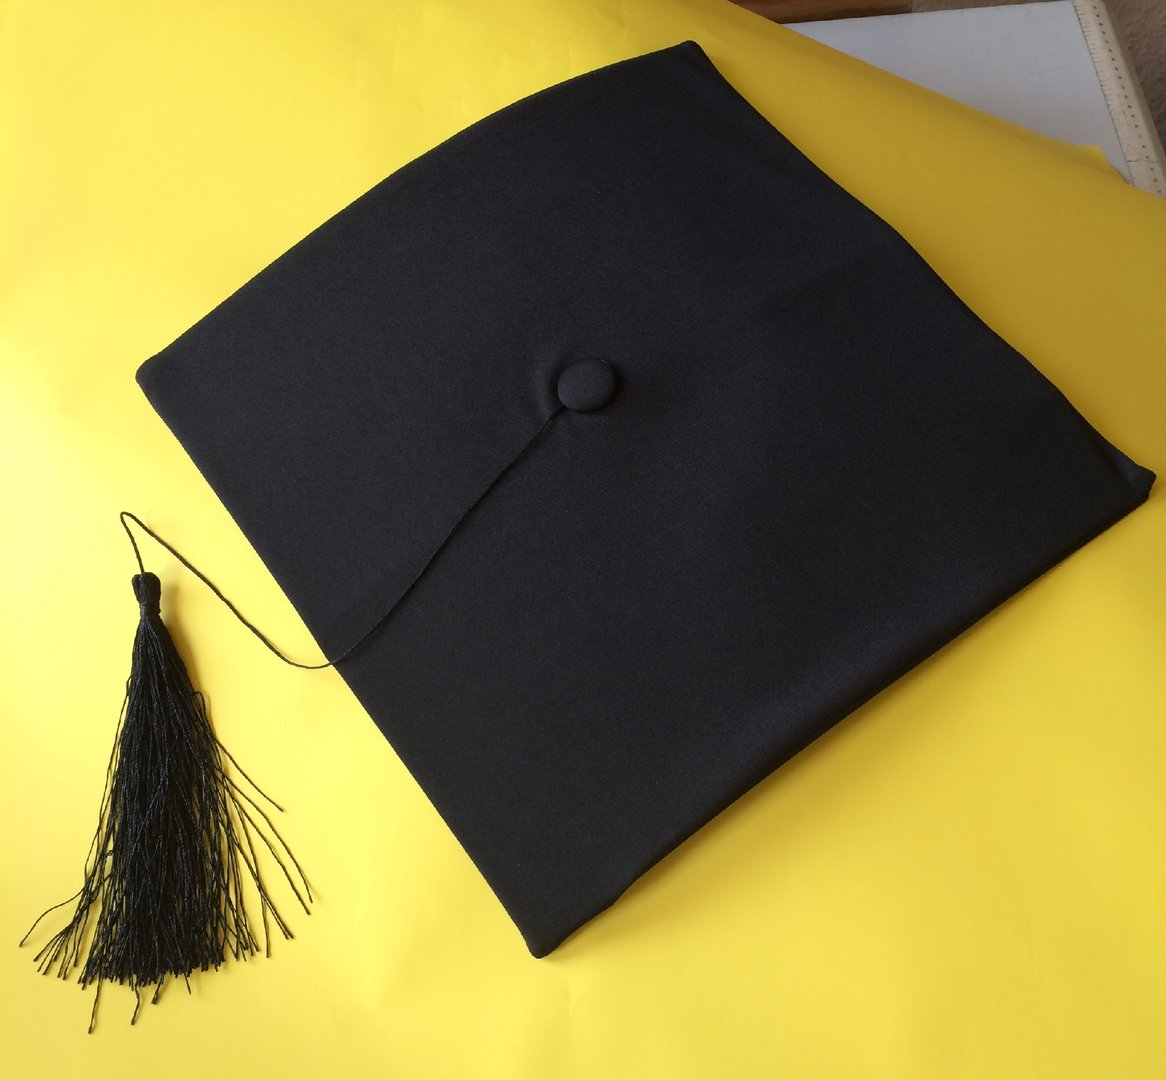 Deluxe Bachelor Doktor College Absolventen Hut Doctor Cap Doktorhut Diplomhut